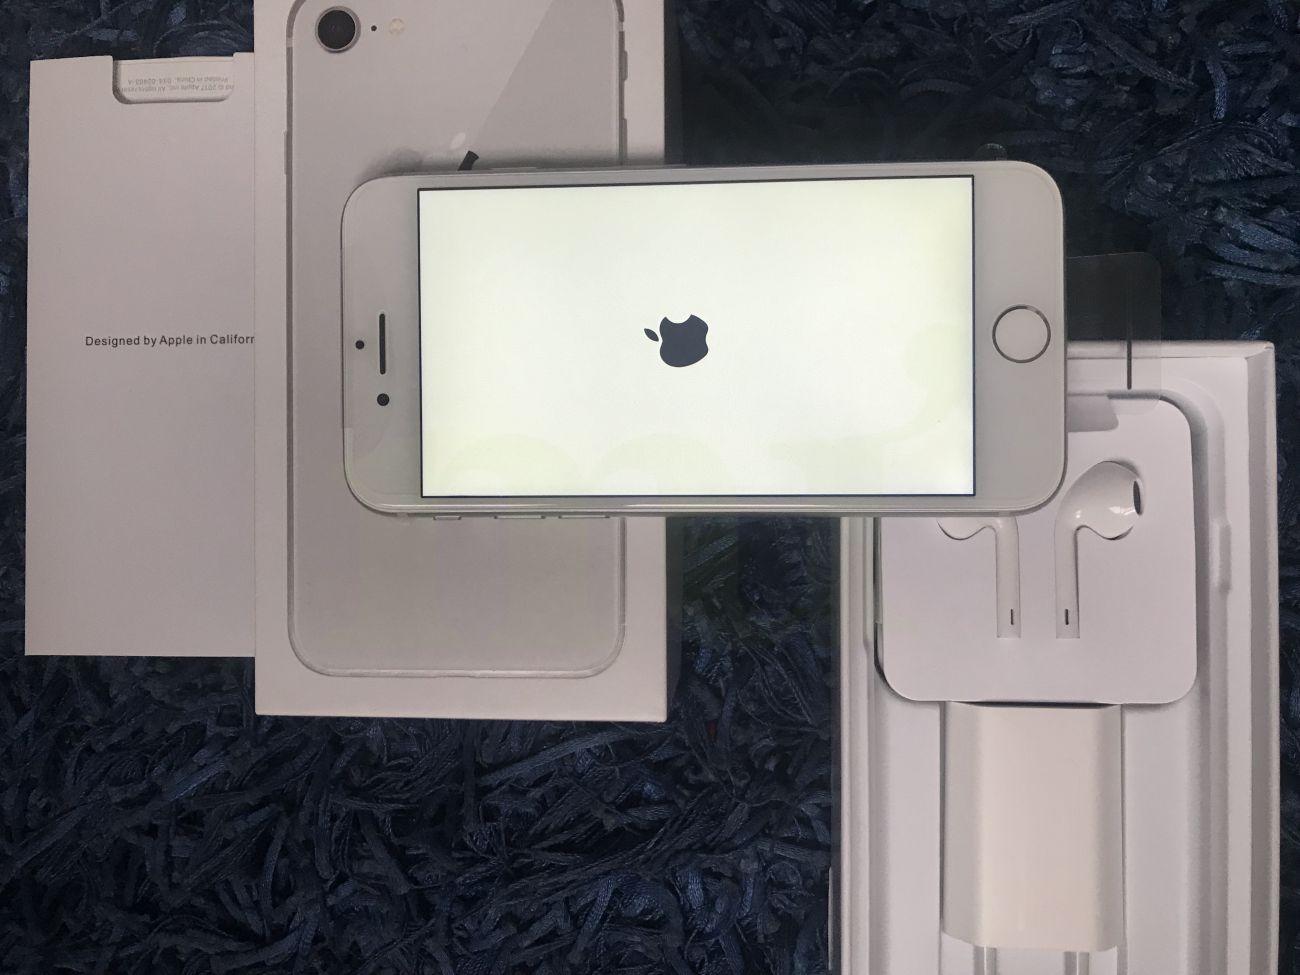 04a4934de66 vender-iphone-iphone-8-apple-segunda-mano-19381739820190712183925-